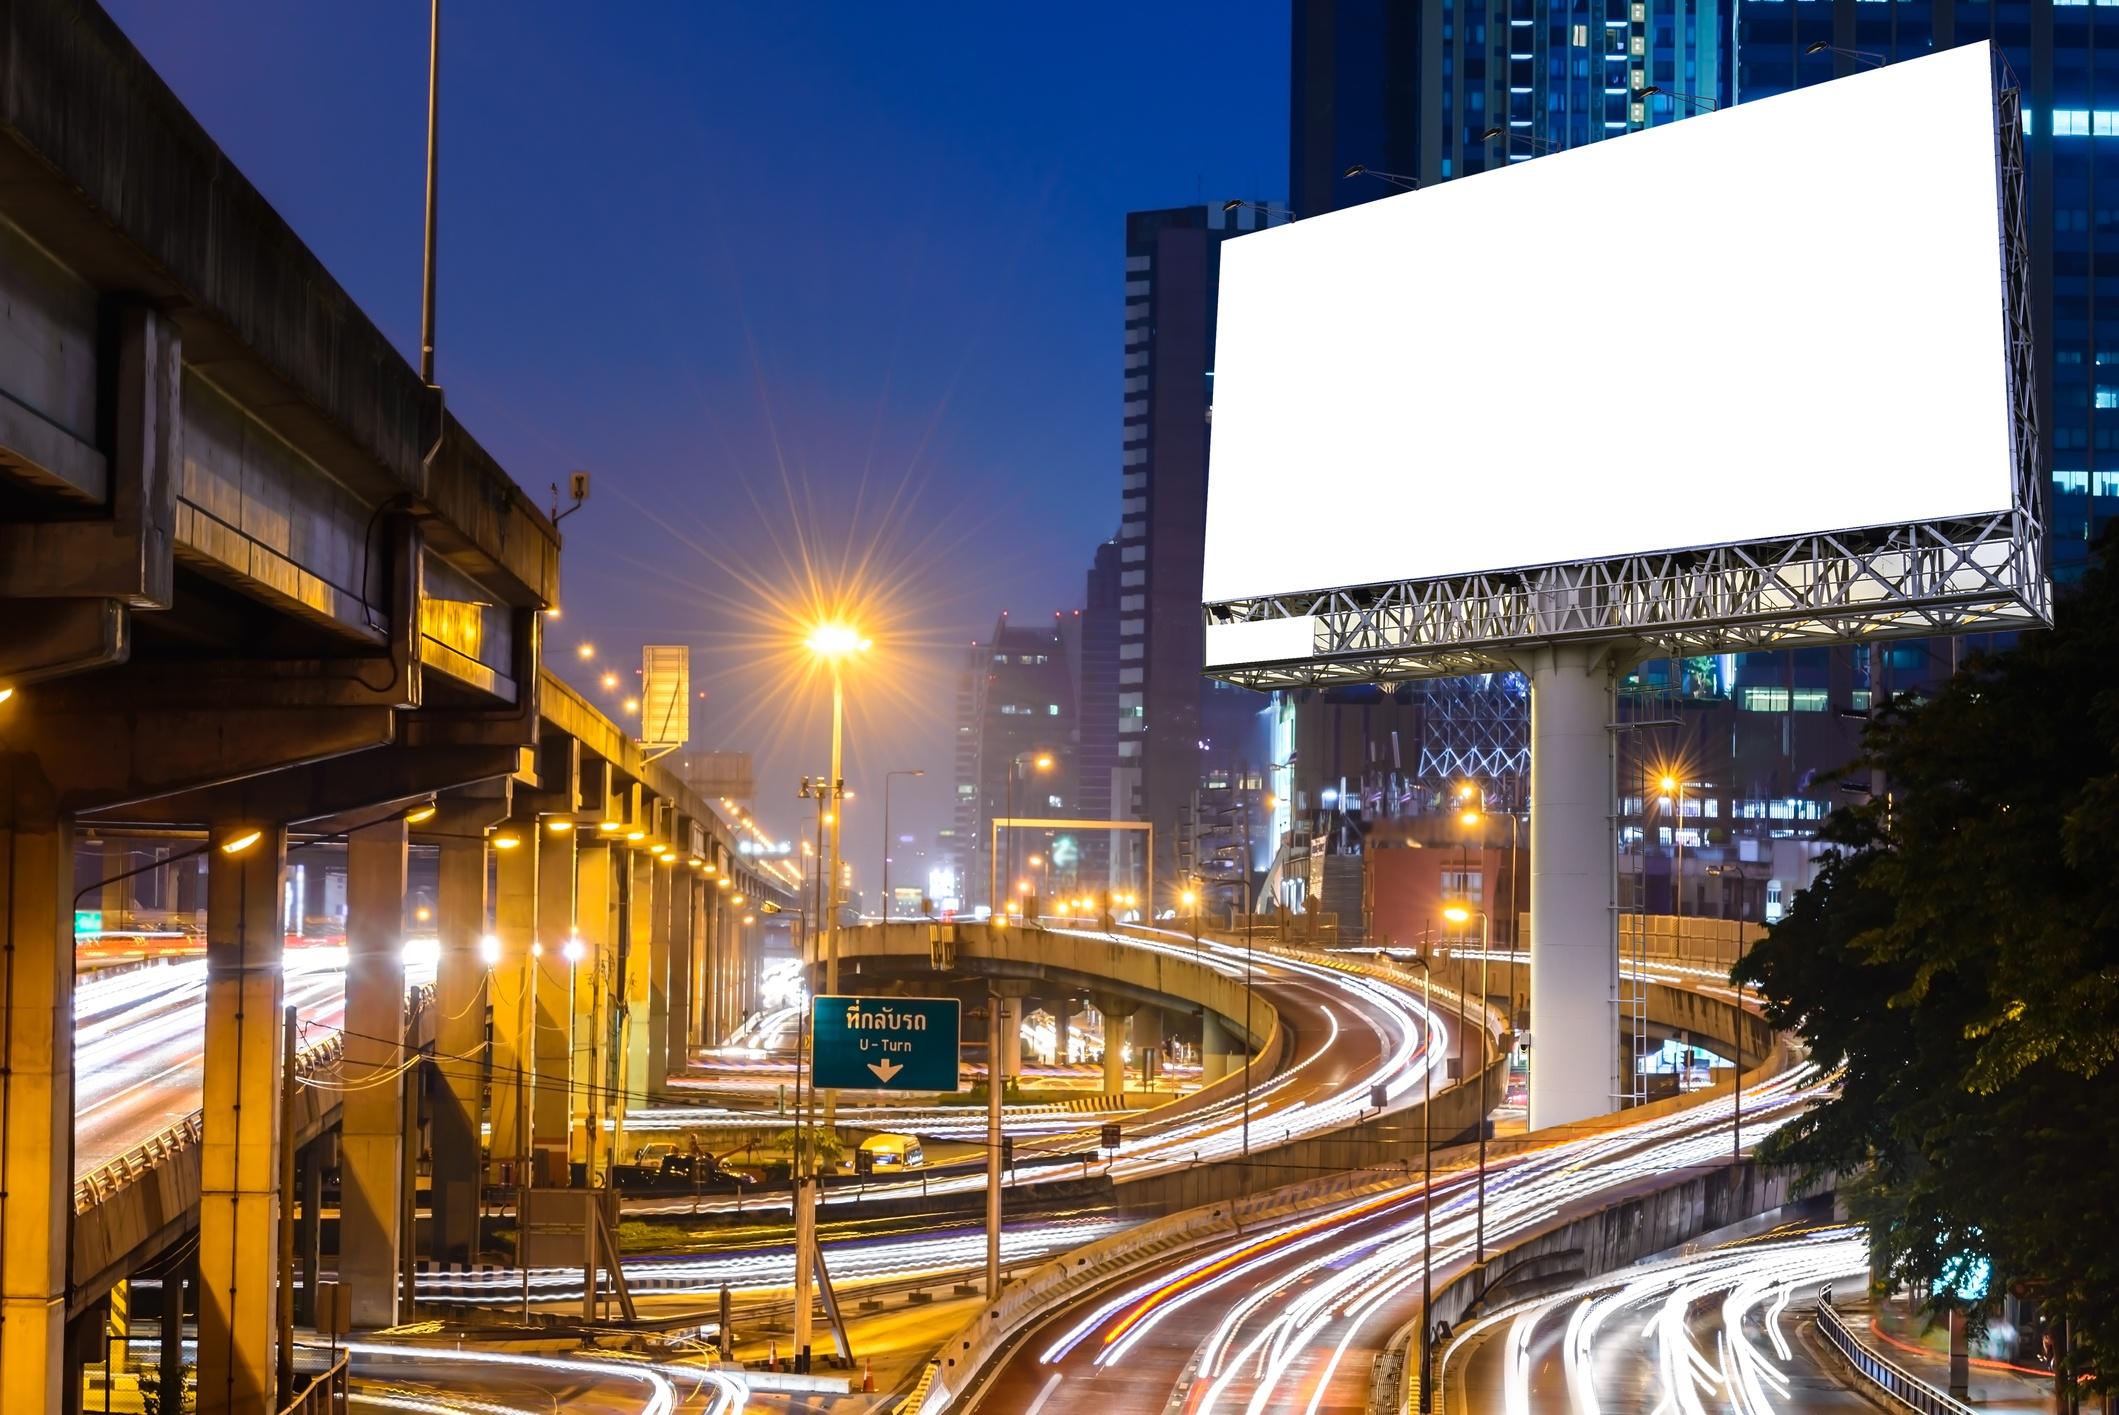 is-restaurant-billboard-advertising-still-effective-in-2017.jpg